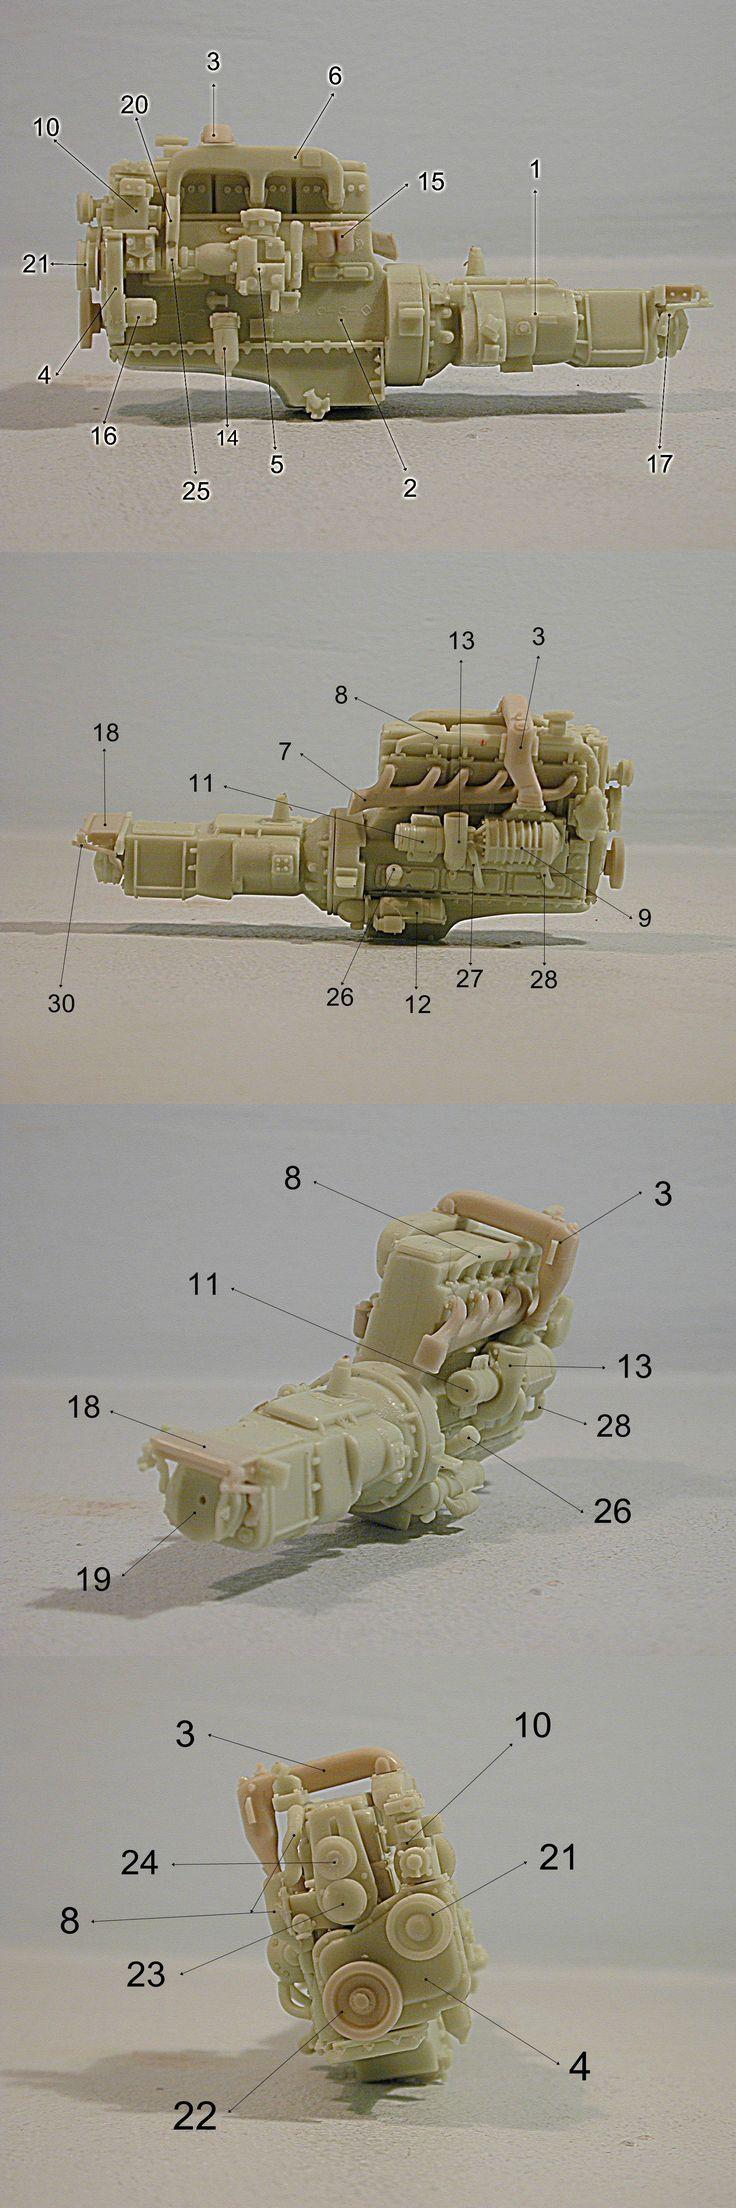 Truck 2584: Cummins Diesel Engine 1:25 Scale Resin Kit -> BUY IT NOW ONLY: $45 on eBay!